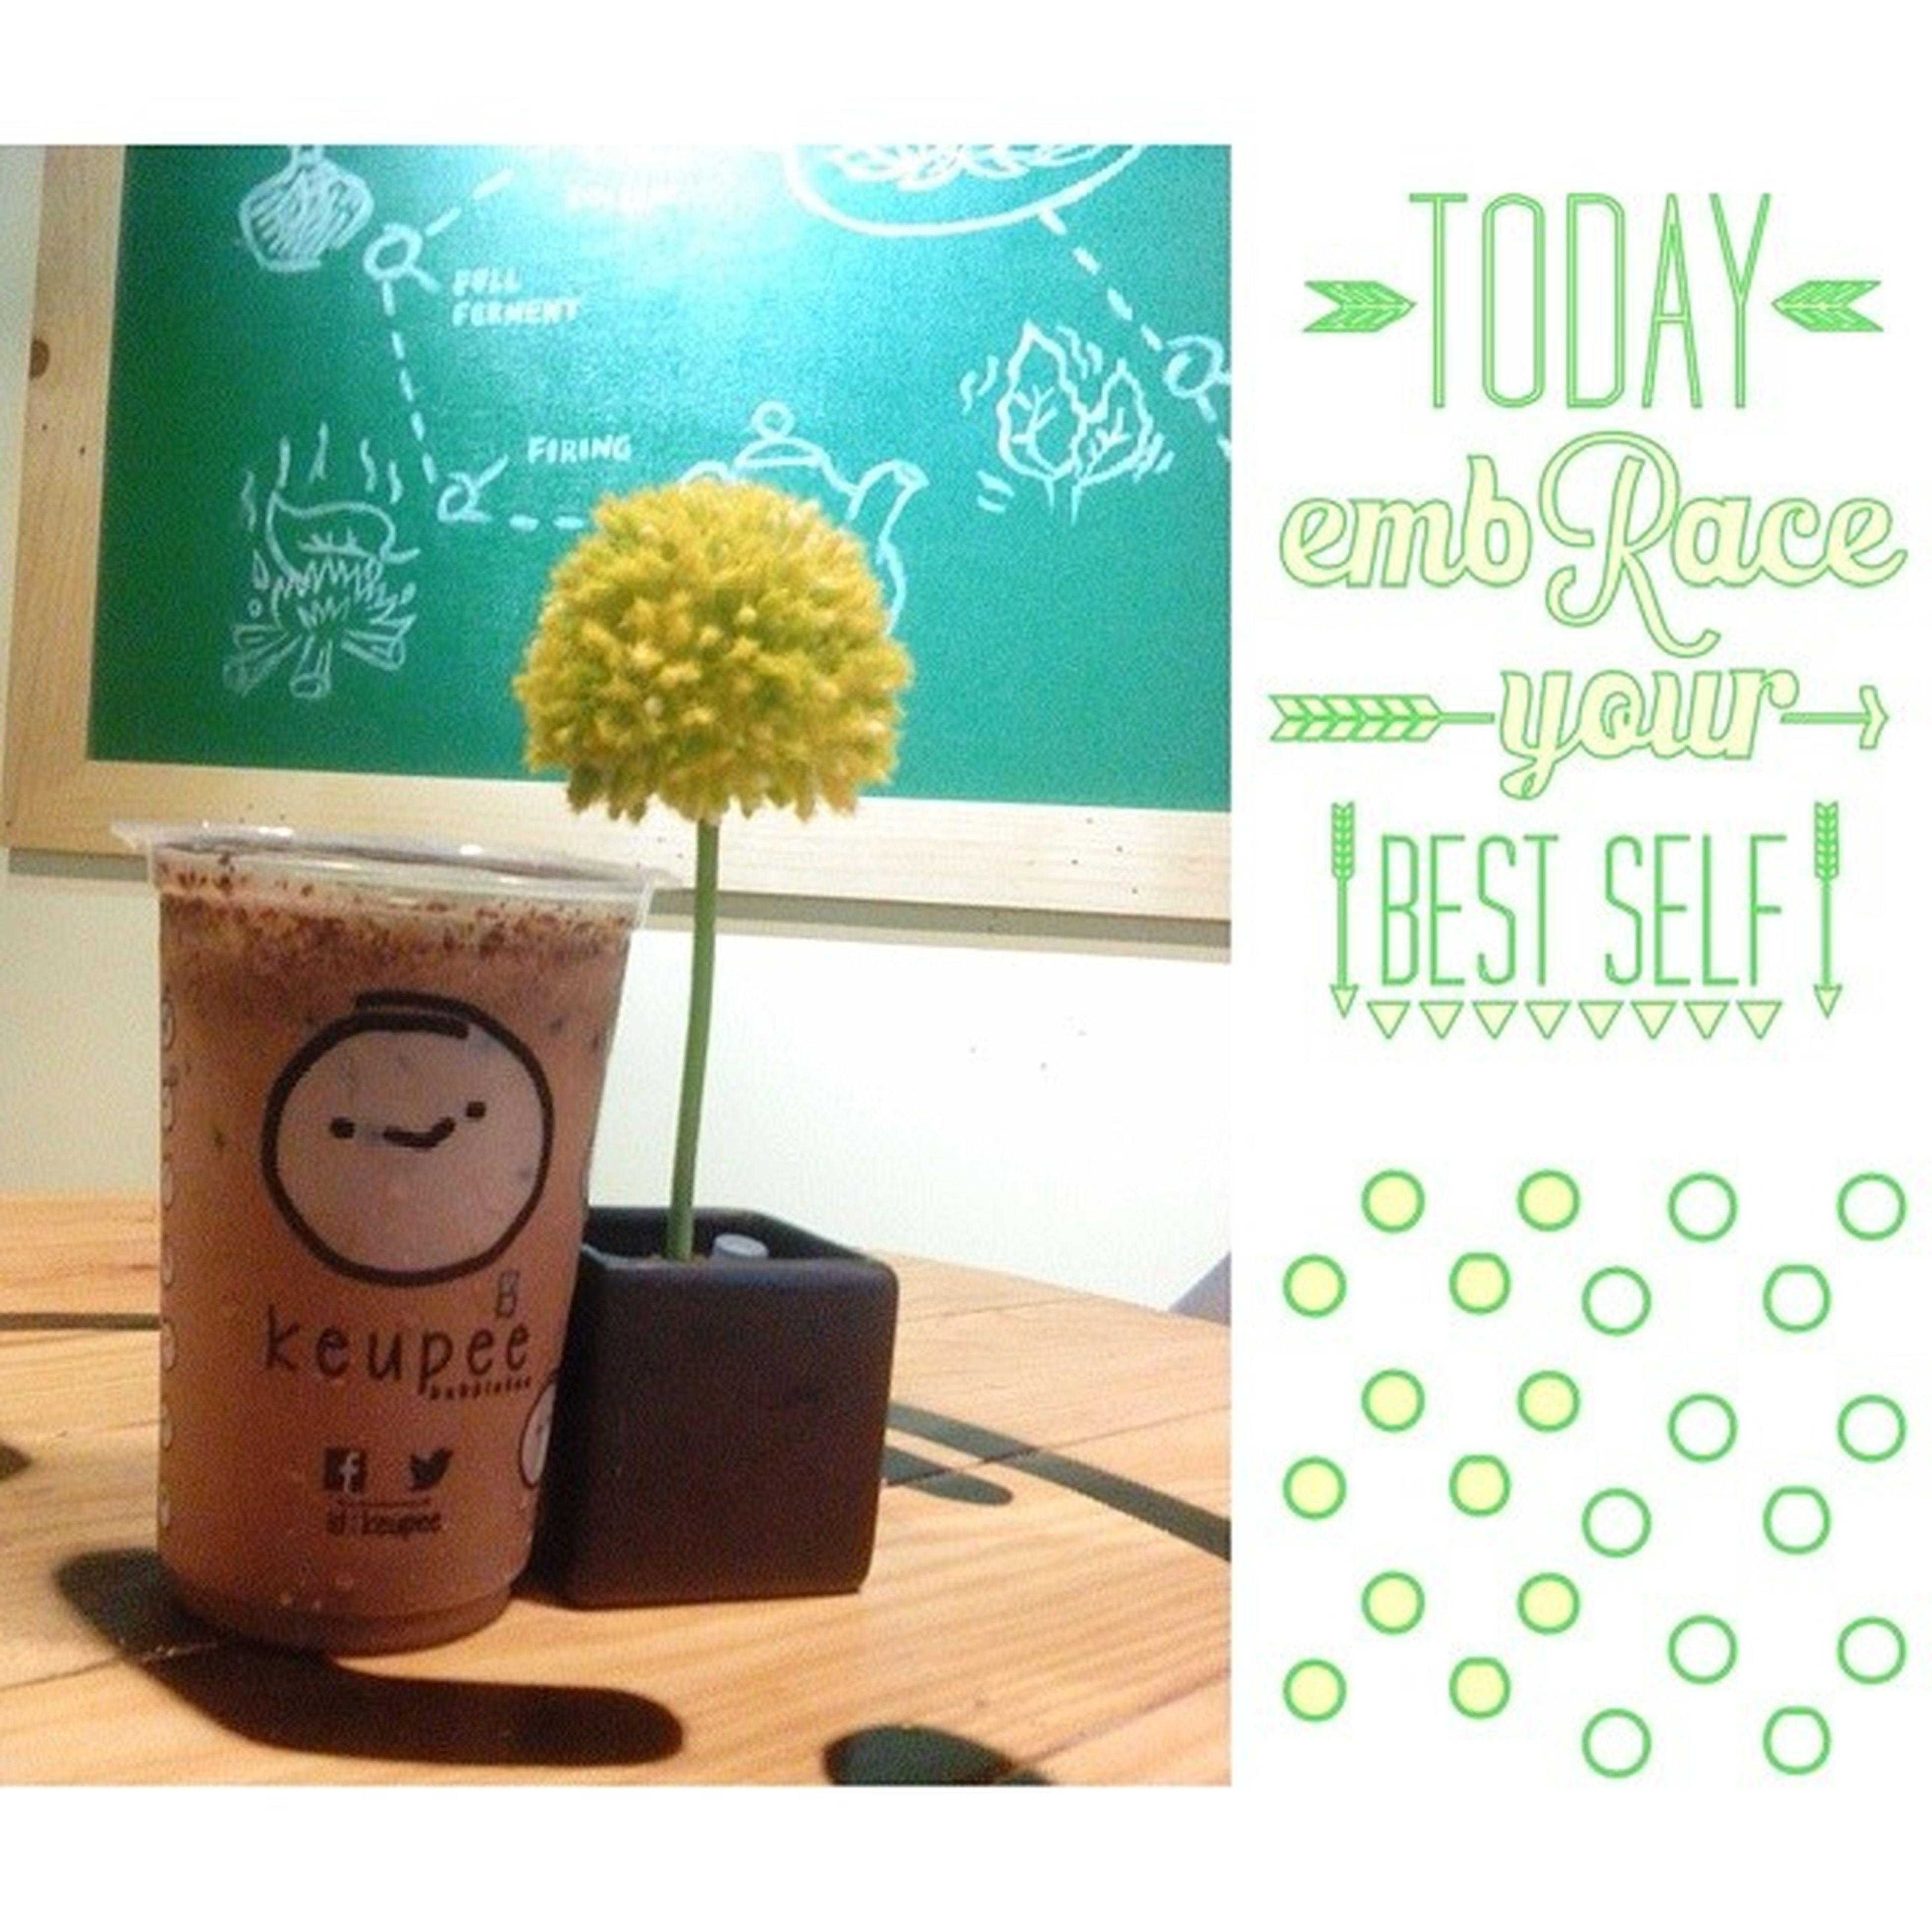 Today embrace your best self! ? Fattyfat Nomnom Yummy Yellowlight vscogasm vscocam vscograph like4like doubletap instafood instameg igdaily